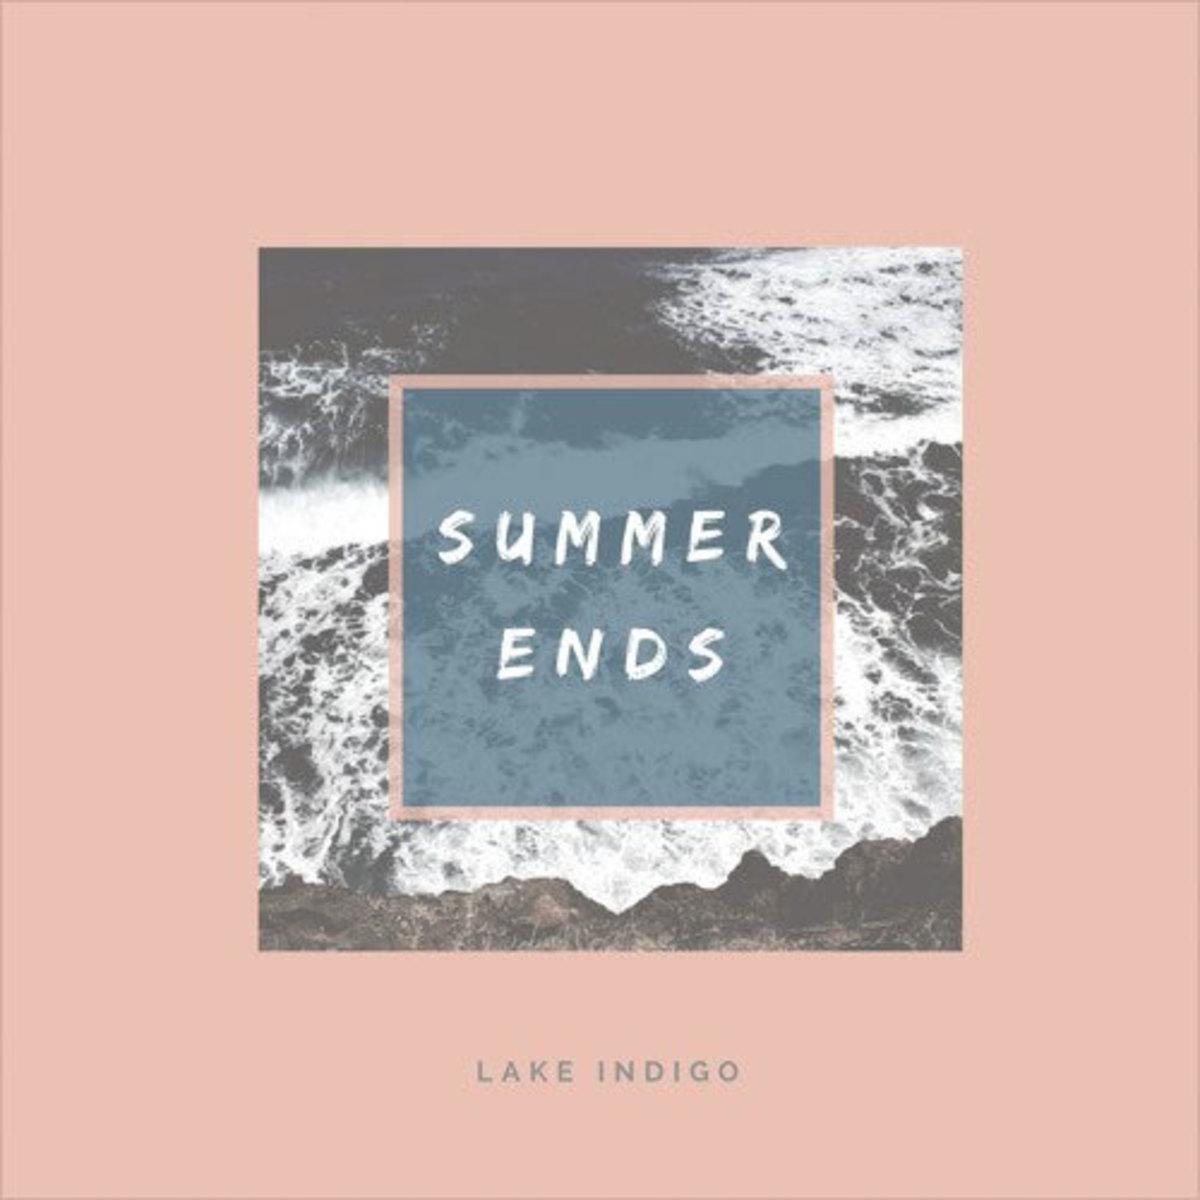 lake-indigo-summer-ends.jpg